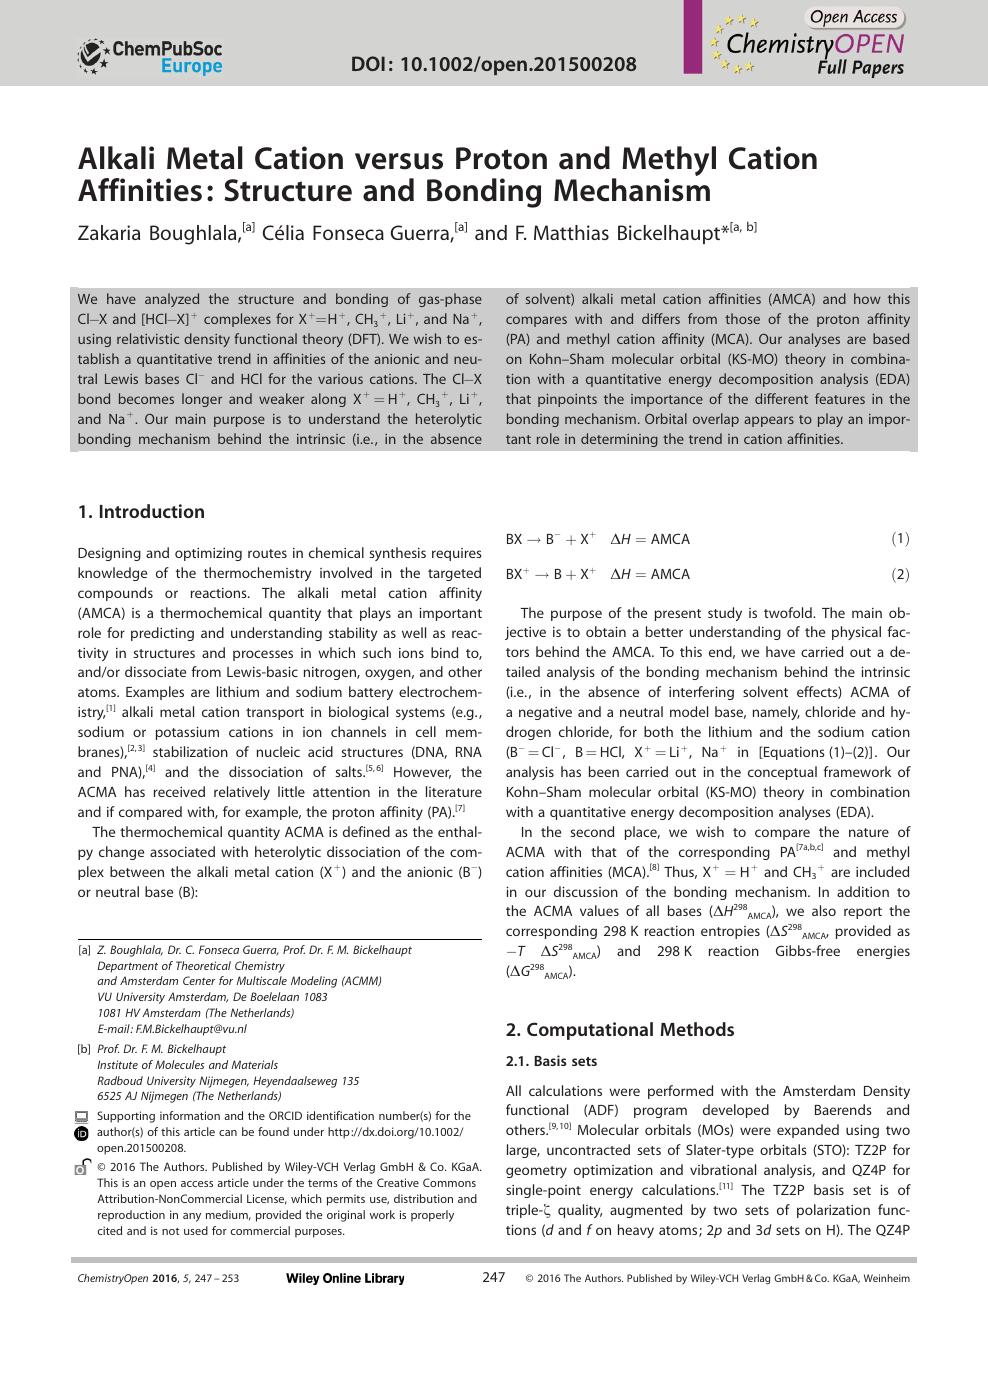 Alkali Metal Cation versus Proton and Methyl Cation